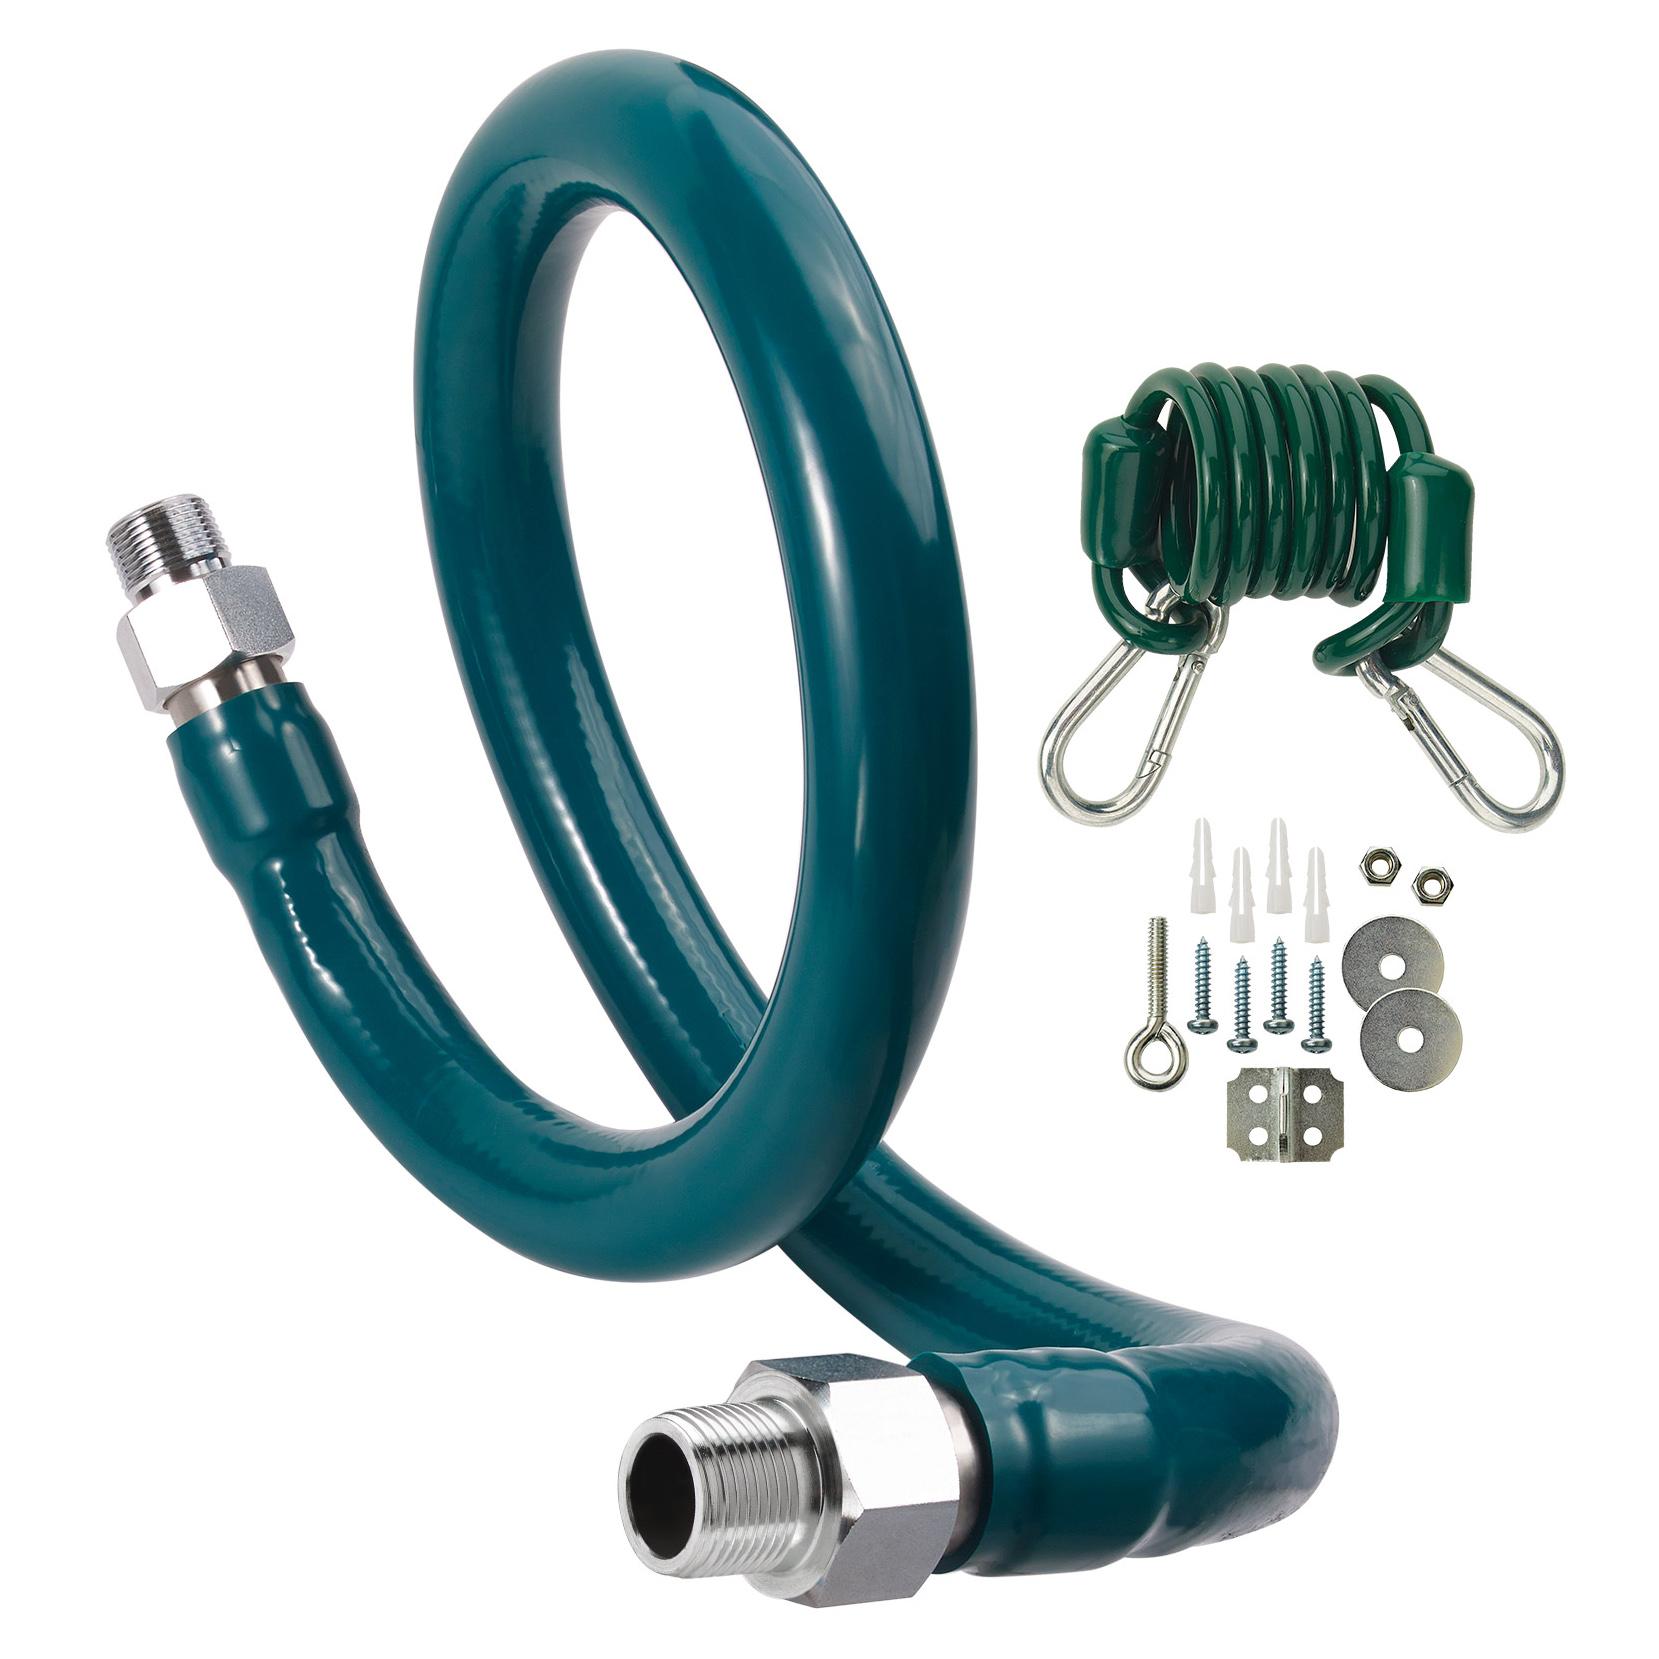 Krowne Metal M10048K6 gas connector hose kit